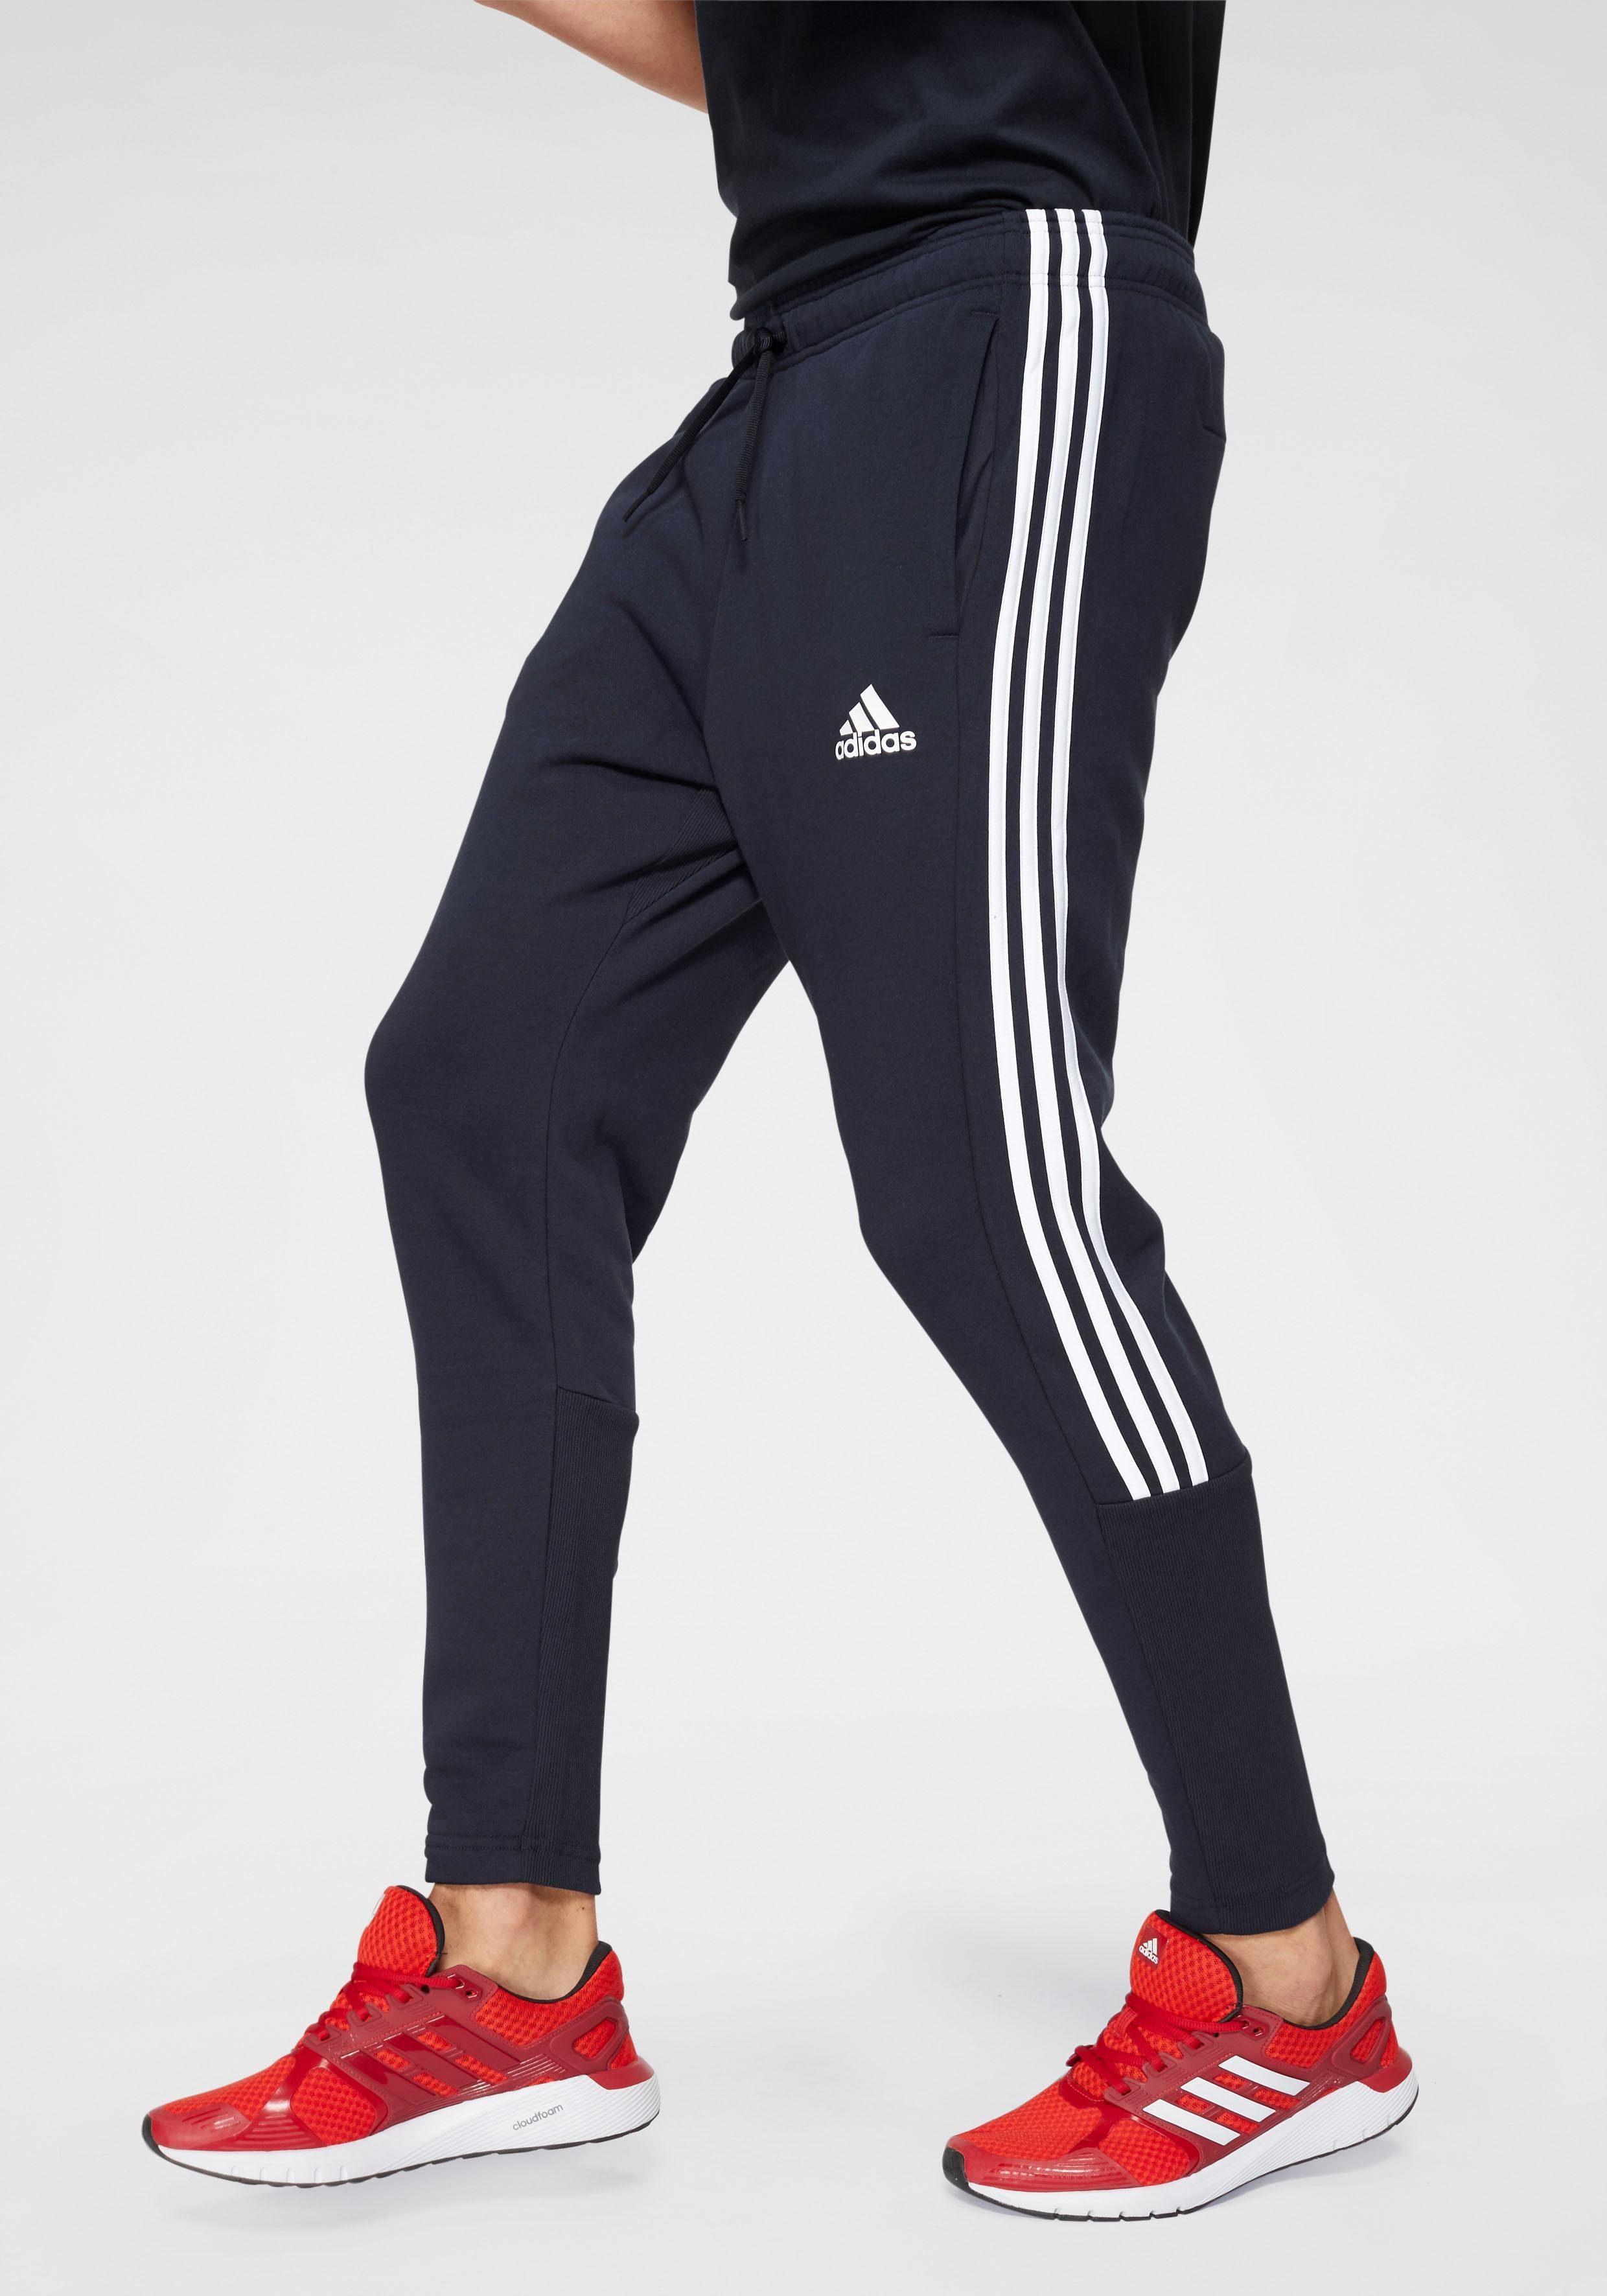 adidas Performance Jogginghose »MH 3 STRIPES TIRO PANT FT« online kaufen | OTTO